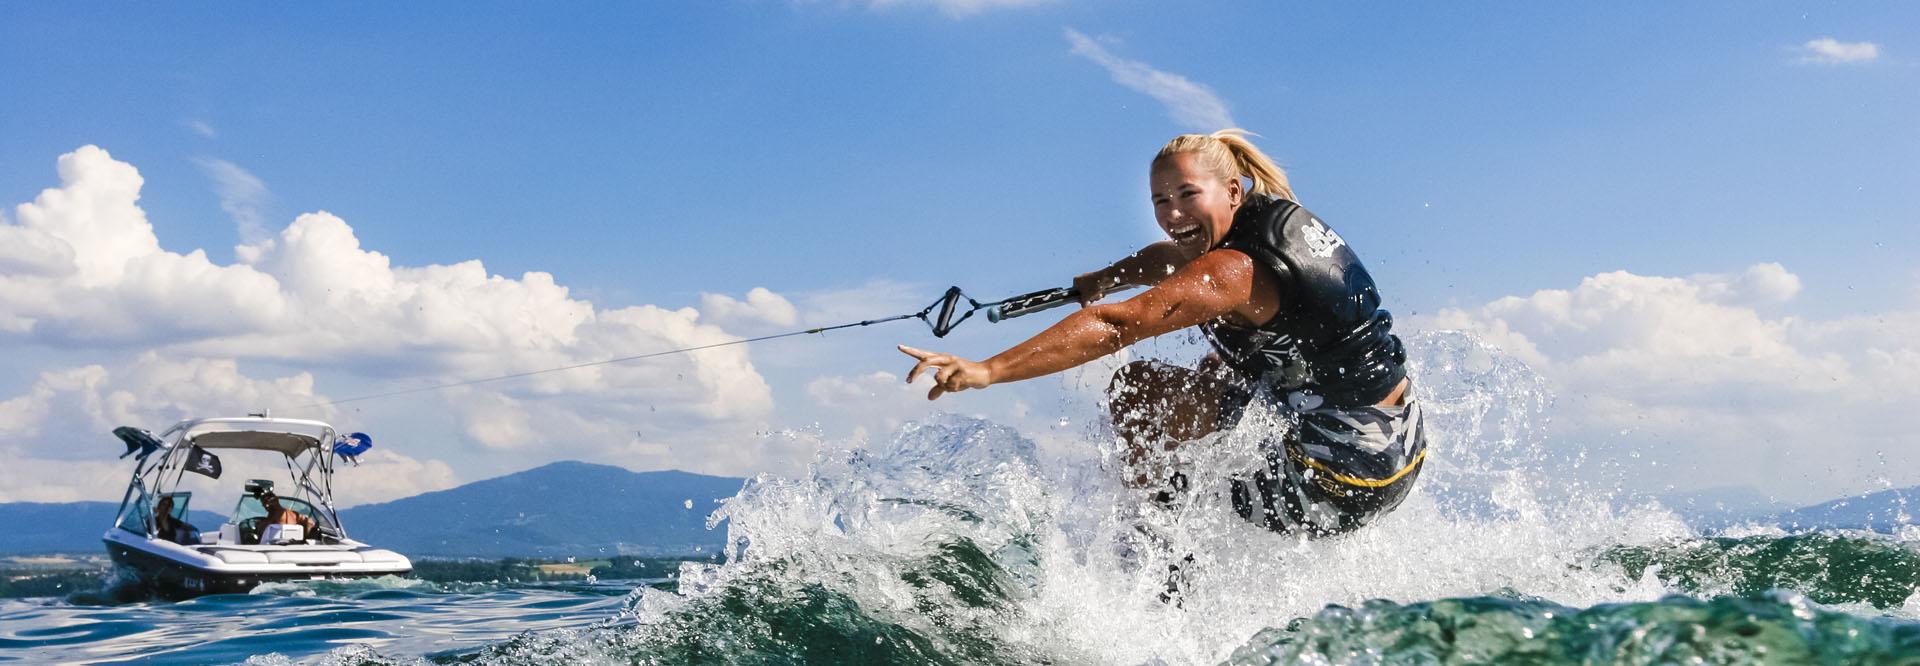 femme faisant du wake board